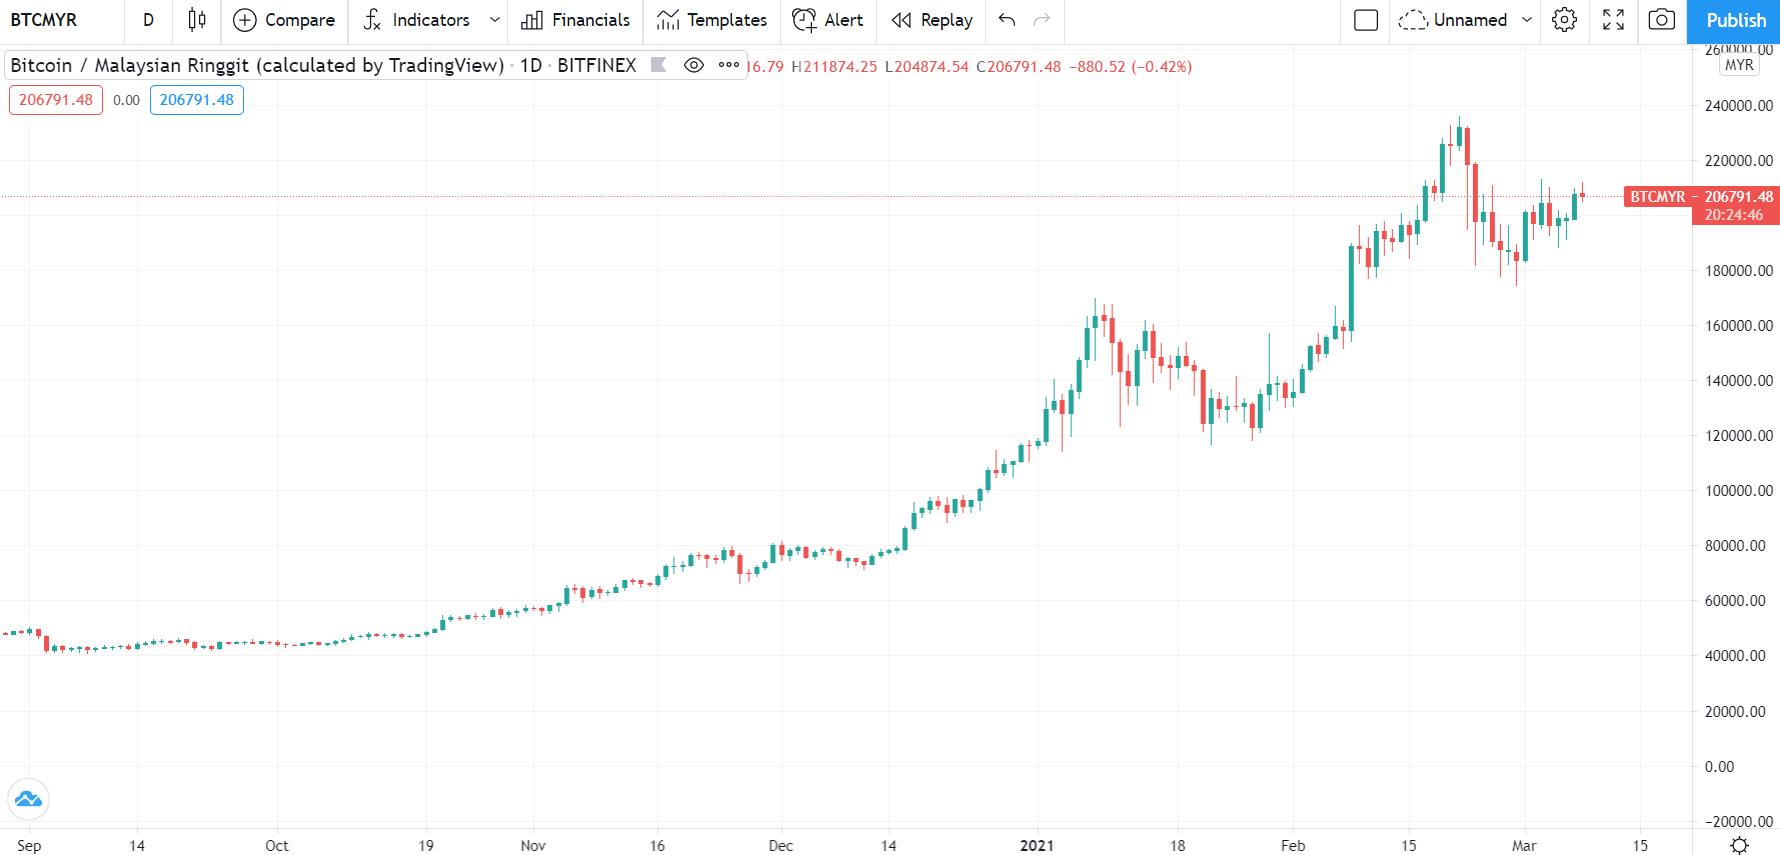 Bagaimana Masa Depan Cryptocurrency? - Mahersaham